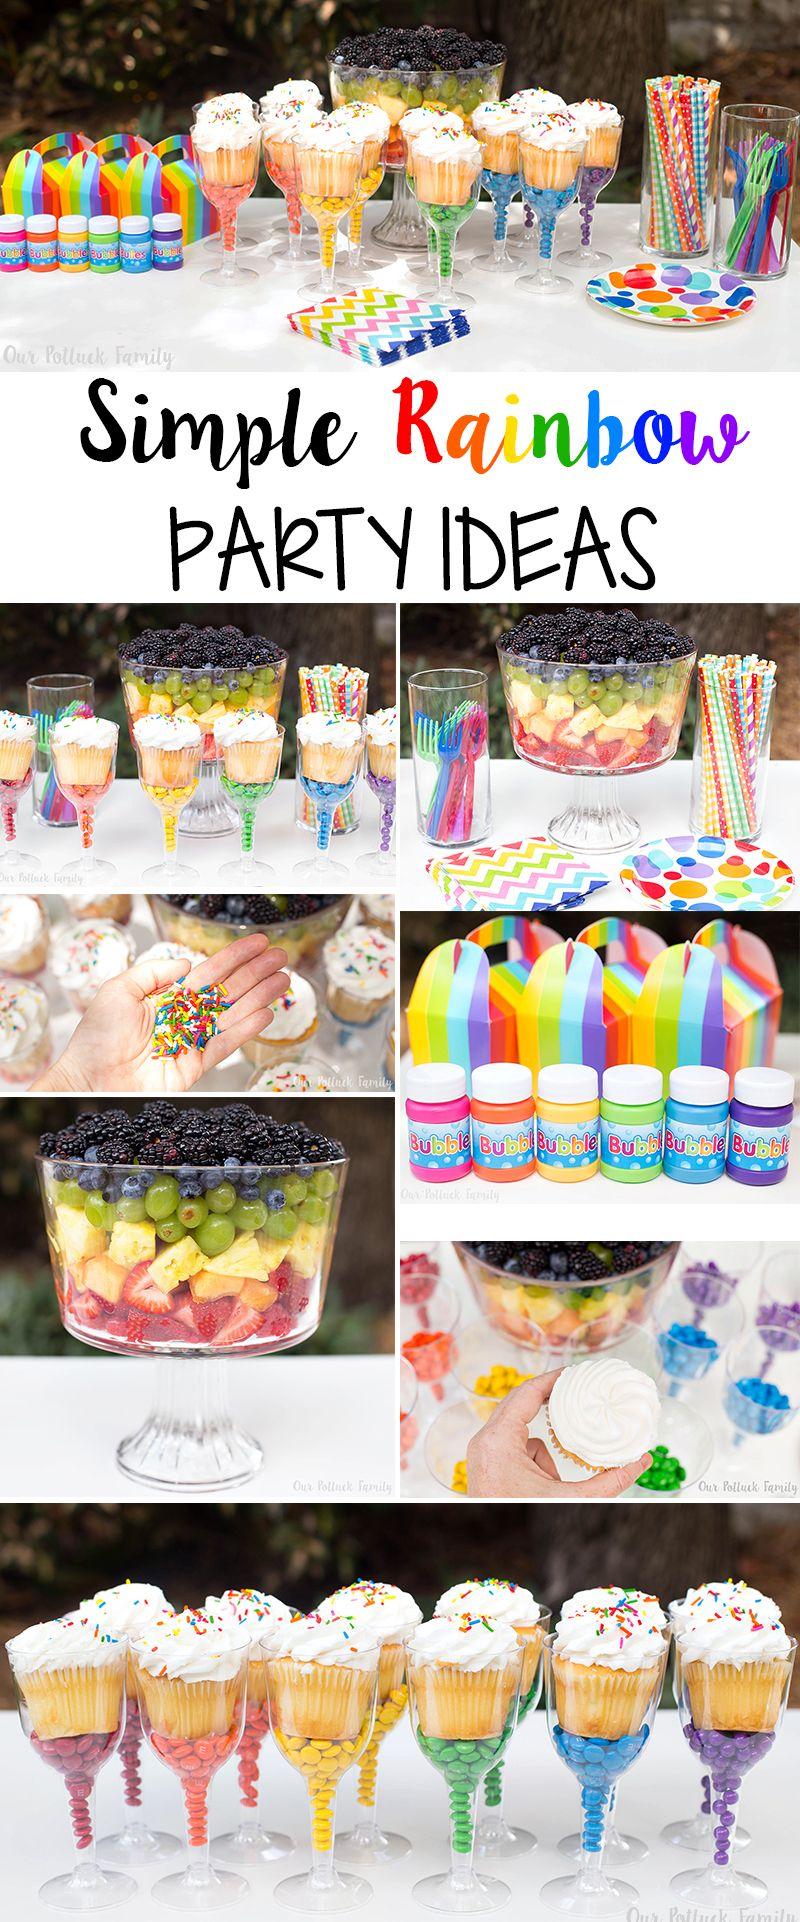 Simple Rainbow Party Ideas – Our Potluck Family